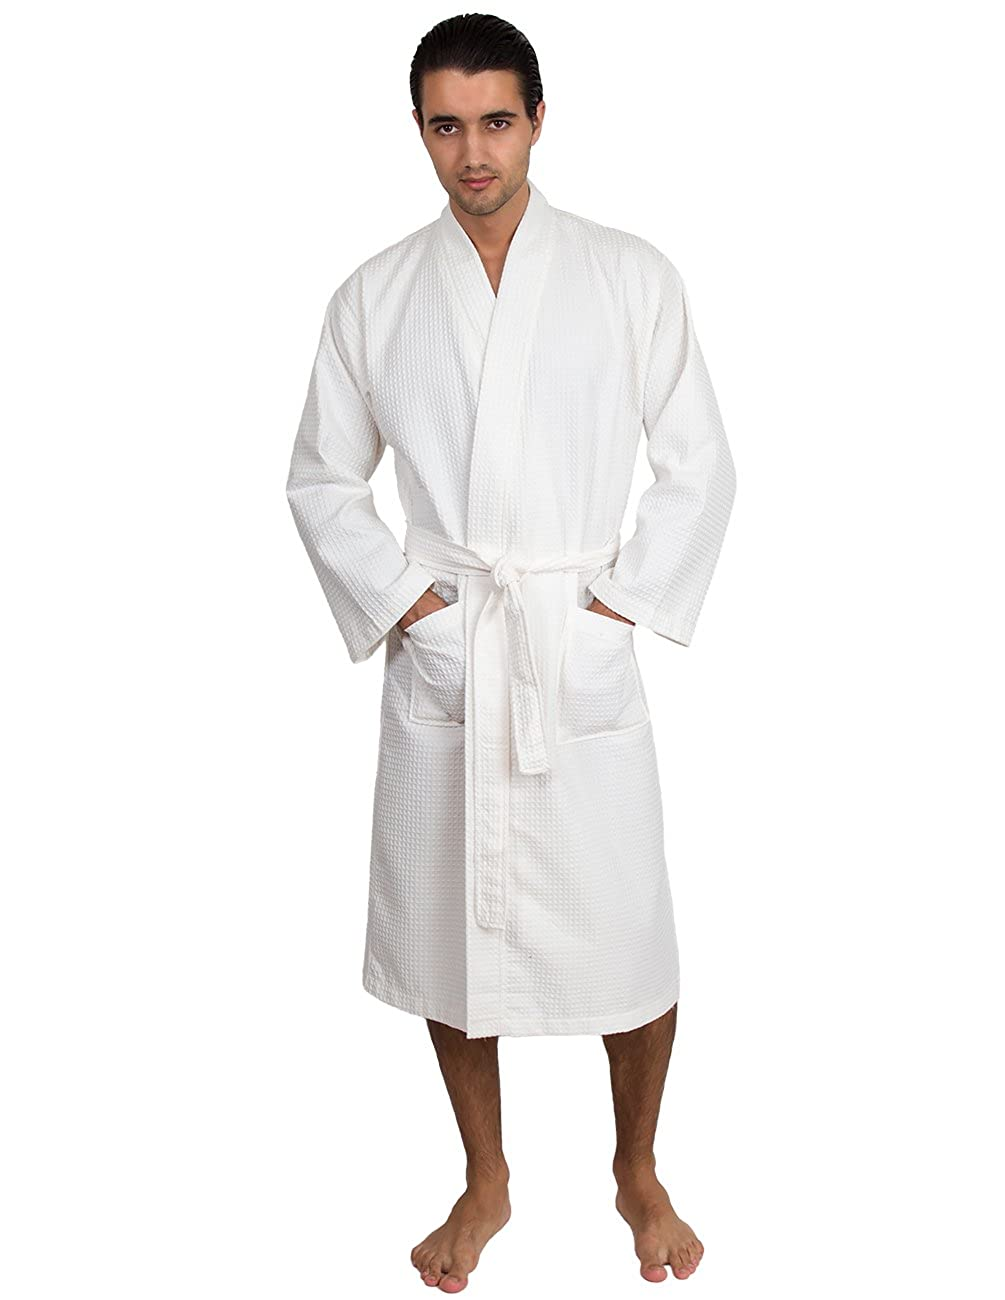 77c63e3969 Amazon.com  TowelSelections Waffle Weave Bathrobe Kimono Collar Spa Robe  Made in Turkey  Clothing